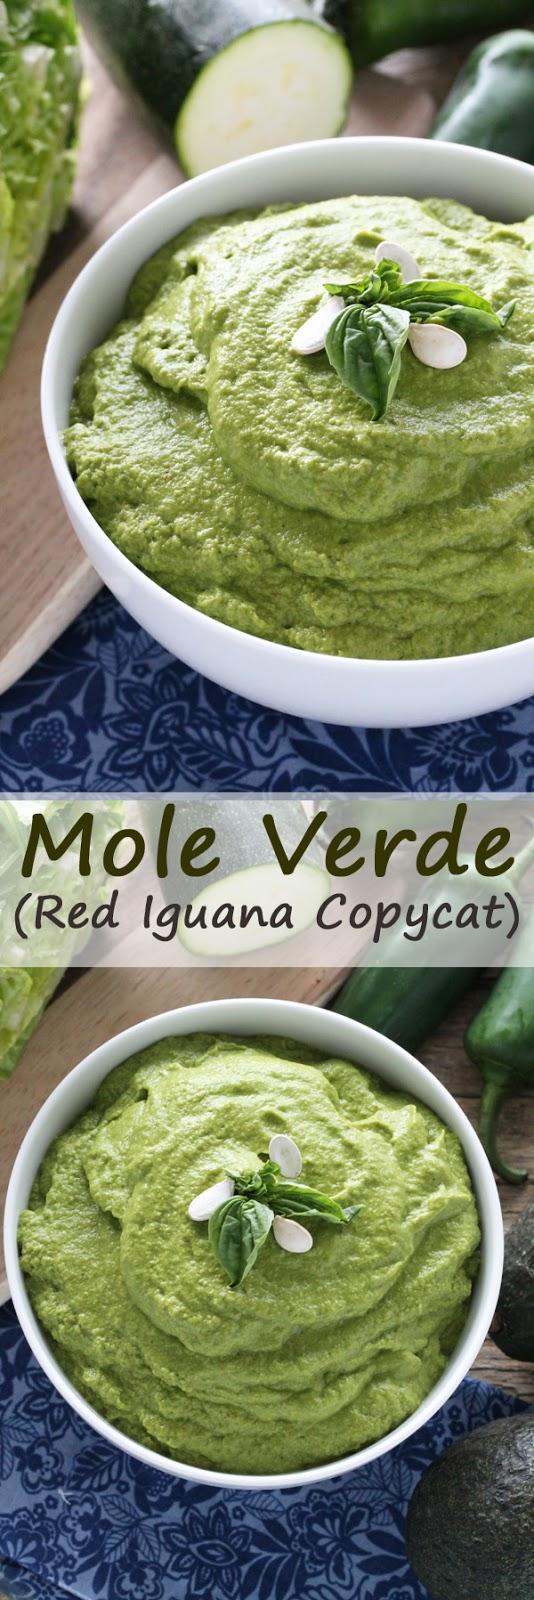 Mole Verde (Red Iguana Copycat)